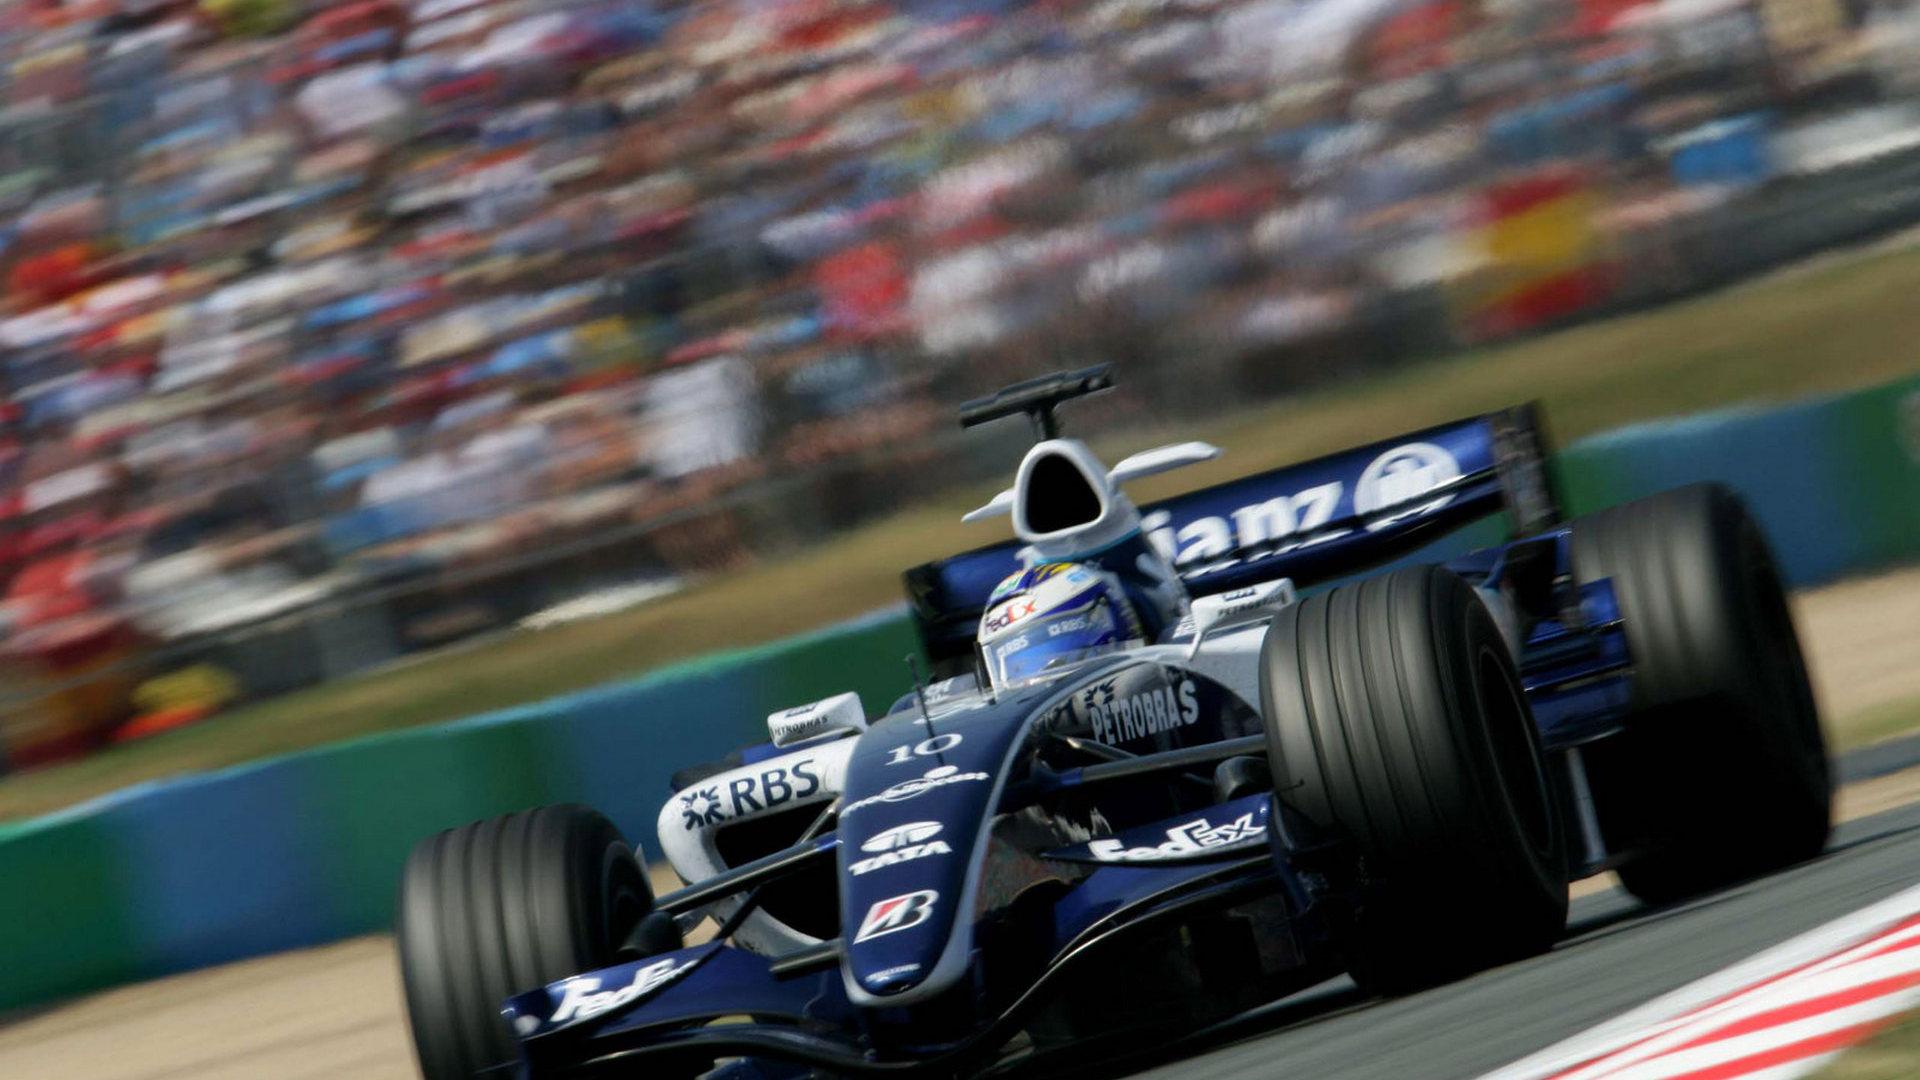 HD Wallpapers 2006 Formula 1 Grand Prix of France | F1 ...